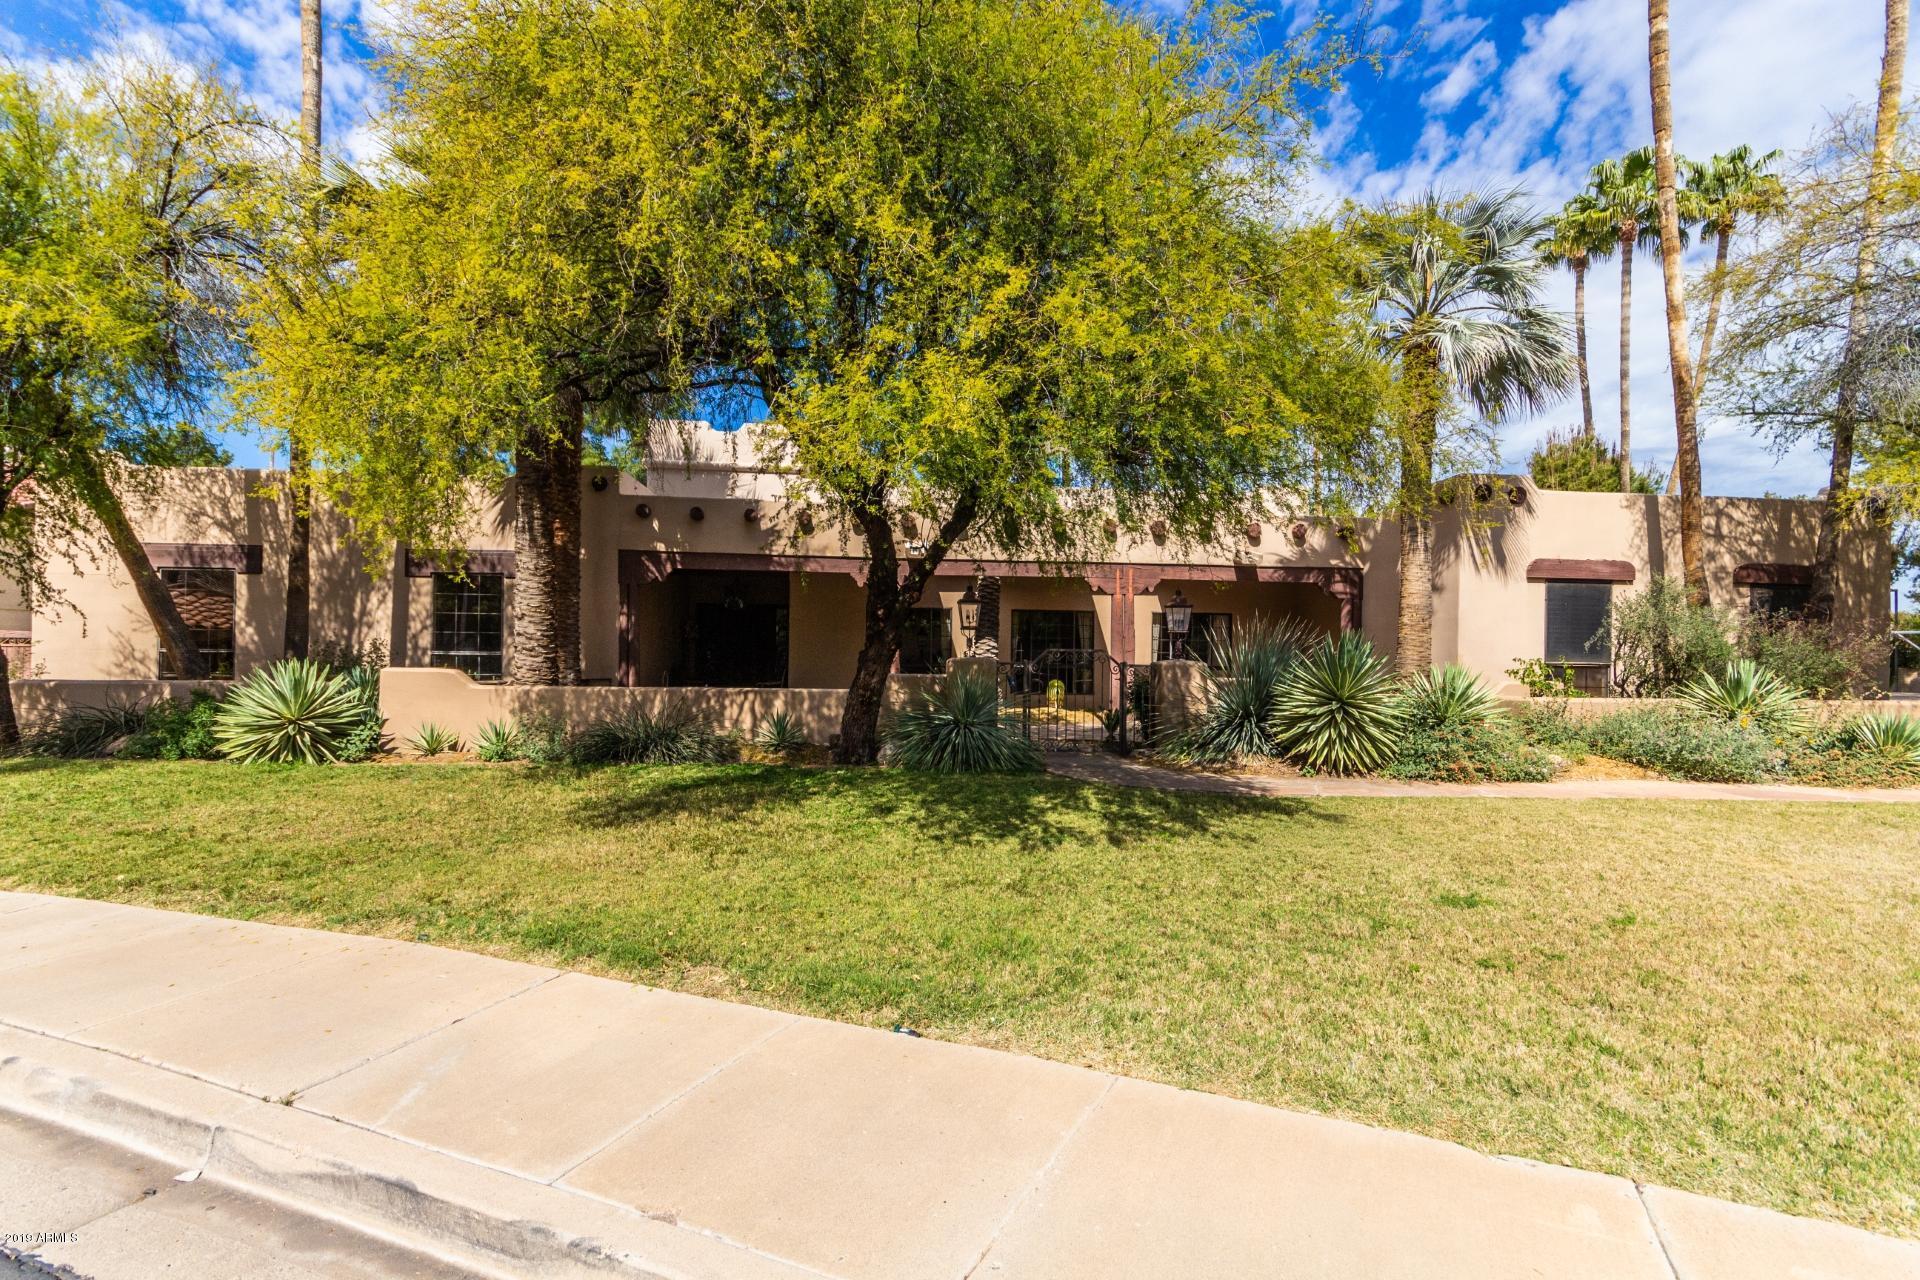 Photo of 1464 W PORT AU PRINCE Lane, Phoenix, AZ 85023